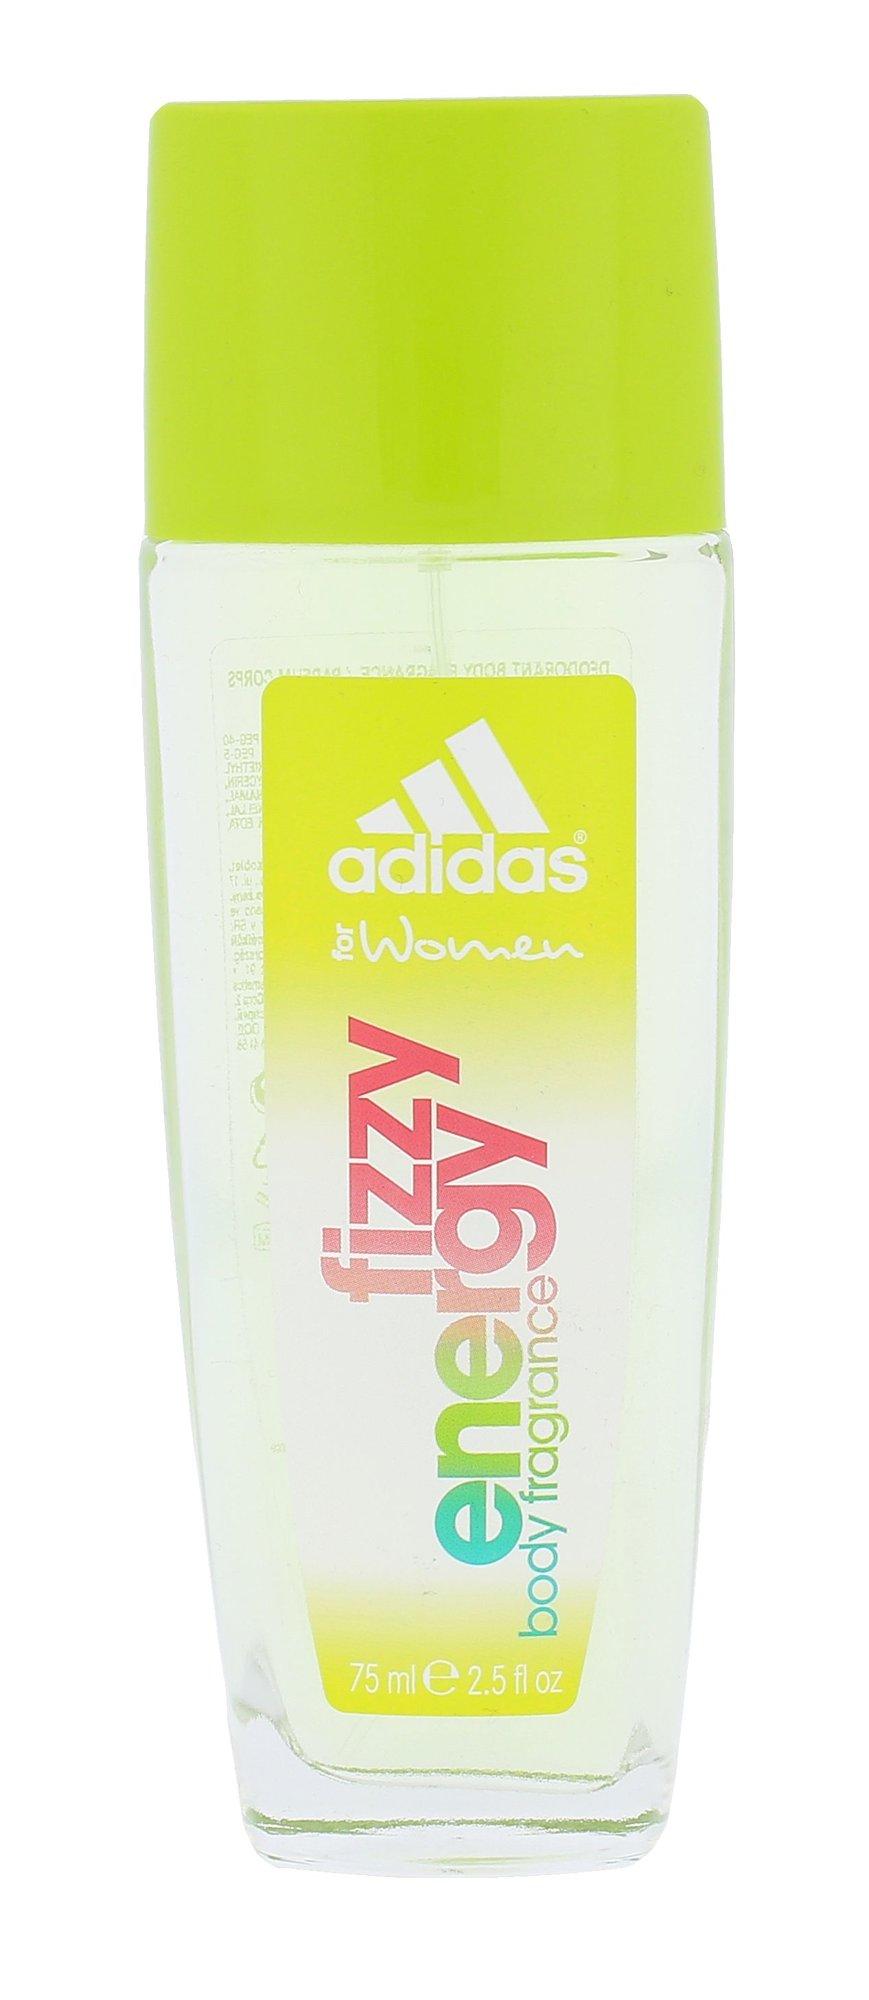 Adidas Fizzy Energy For Women Deodorant 75ml